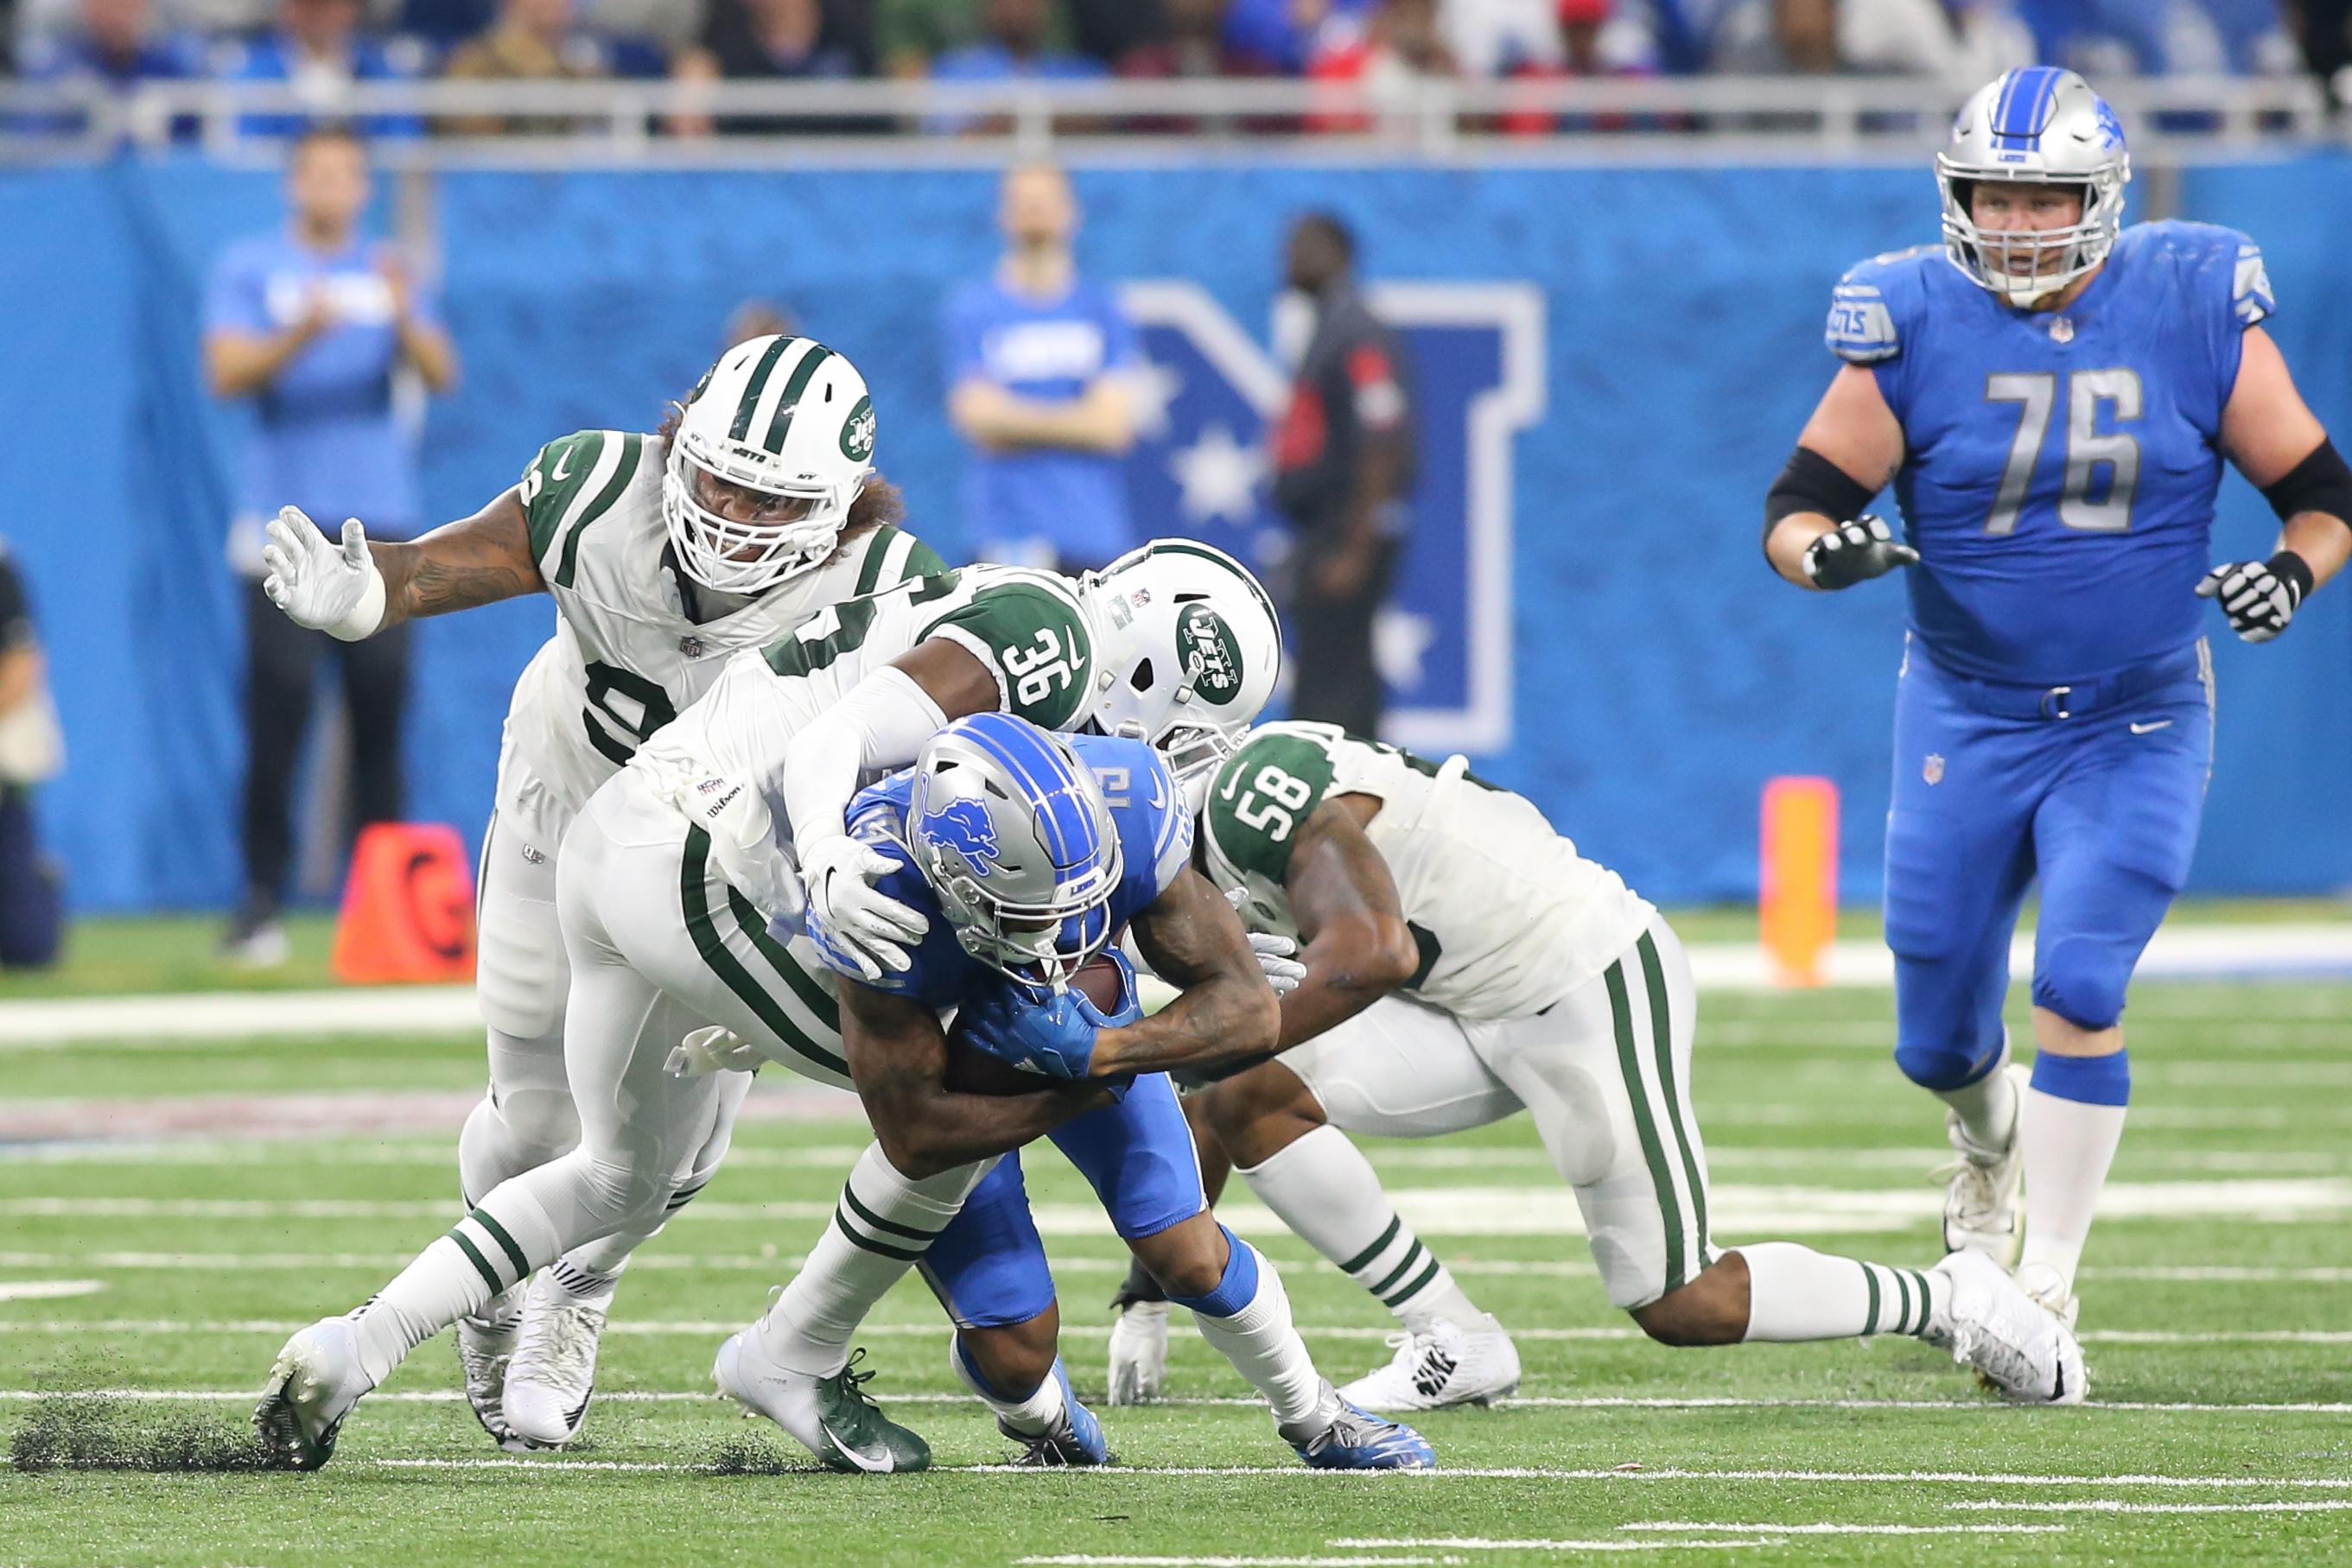 NFL: SEP 10 Jets at Lions